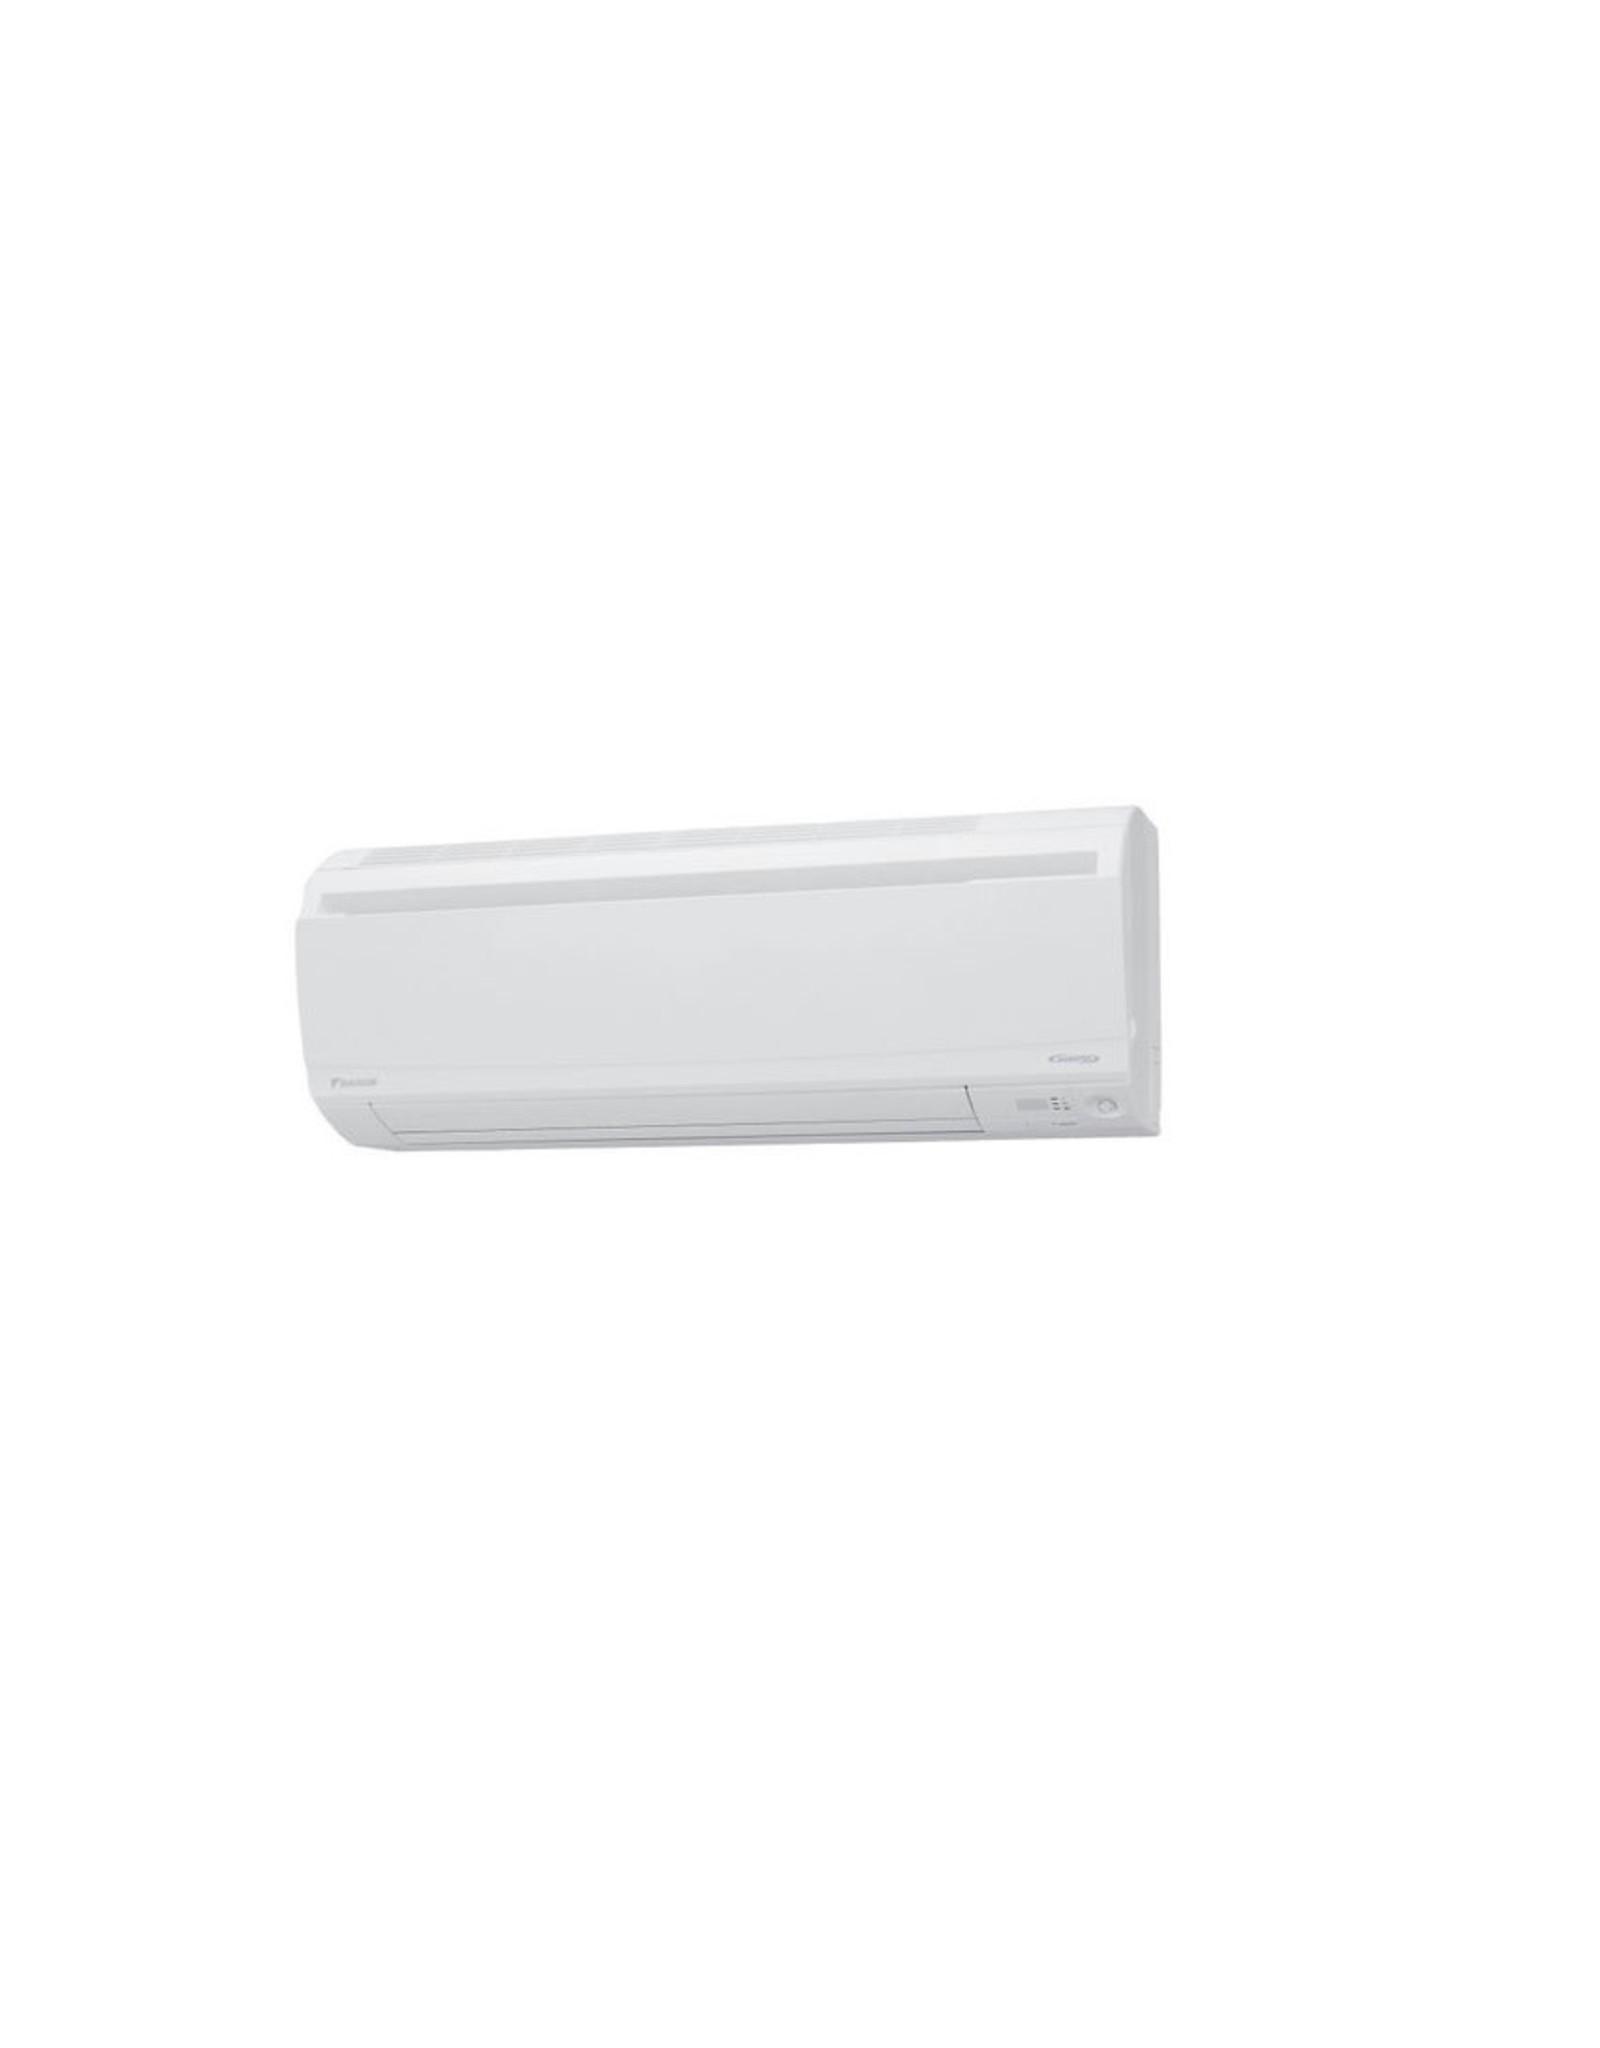 Daikin Applied Americas LV Series Heat-Pump Single Zone Wall Mount AHU - 208/230v - 1ph